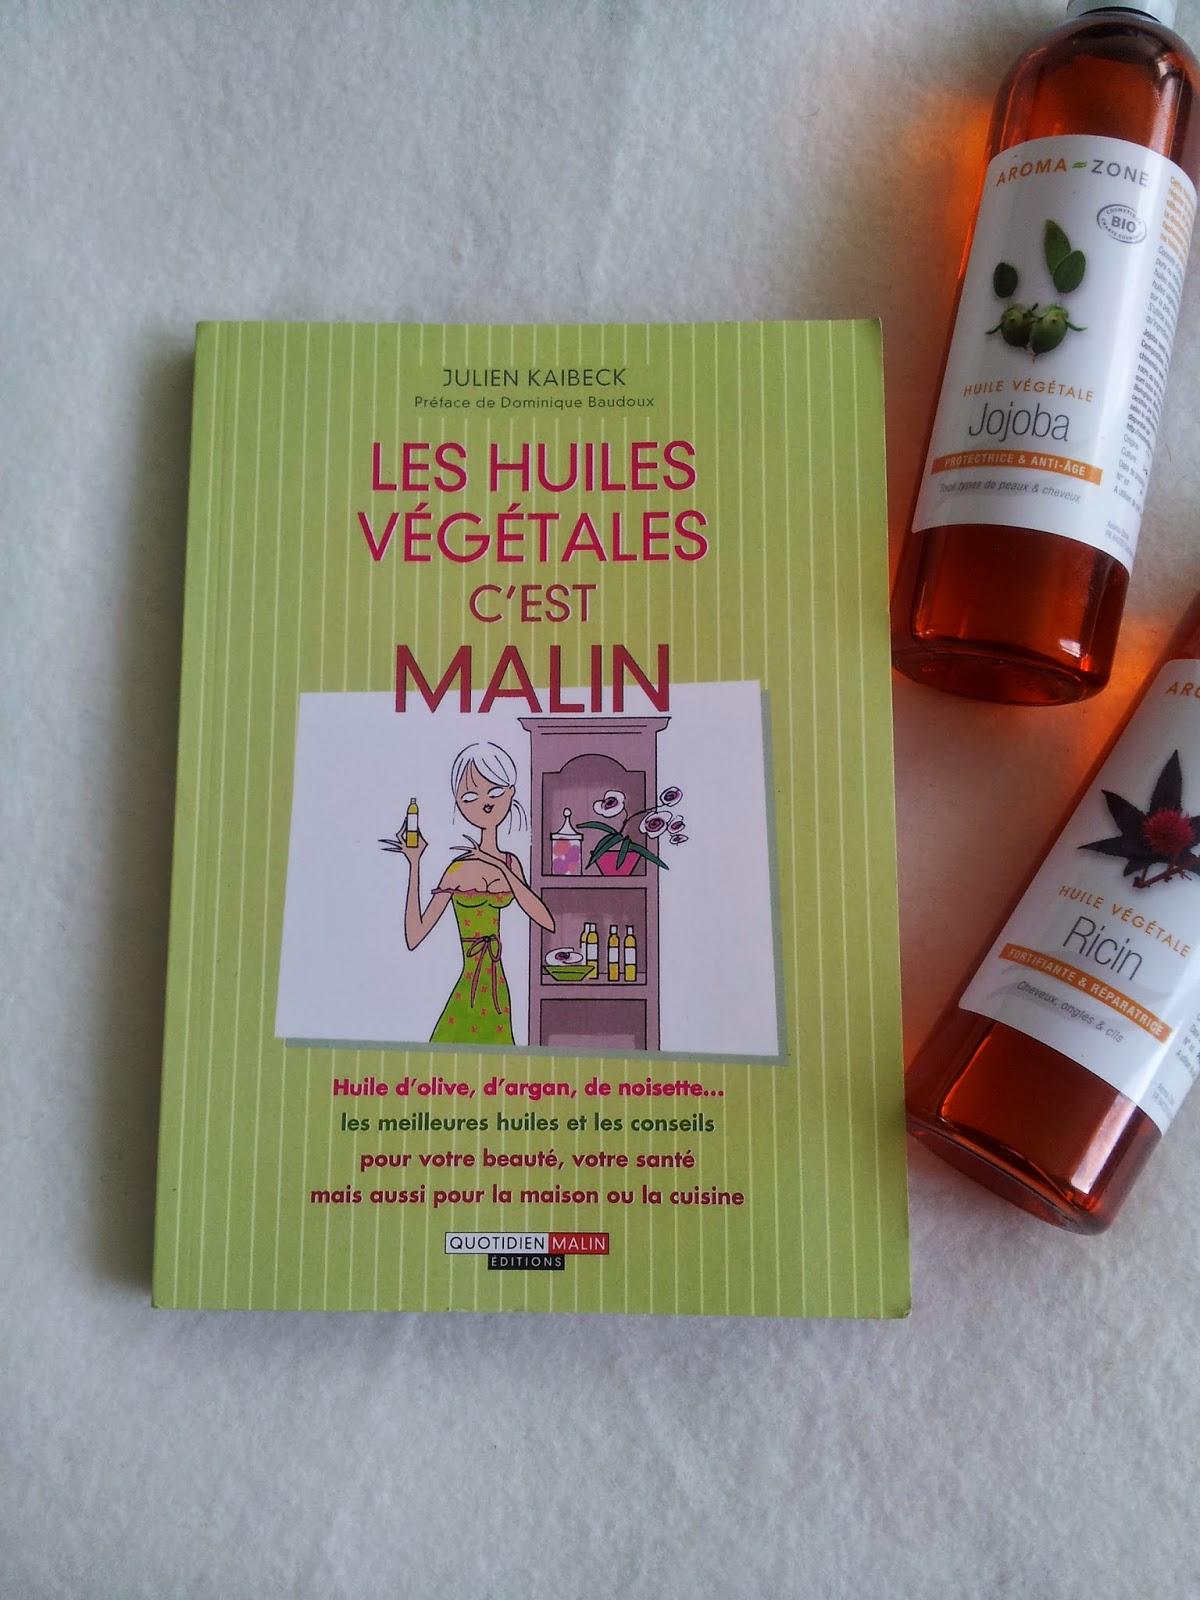 les-huiles-vegetales-c-est-malin-miss-beaute-addict.blogspot.fr